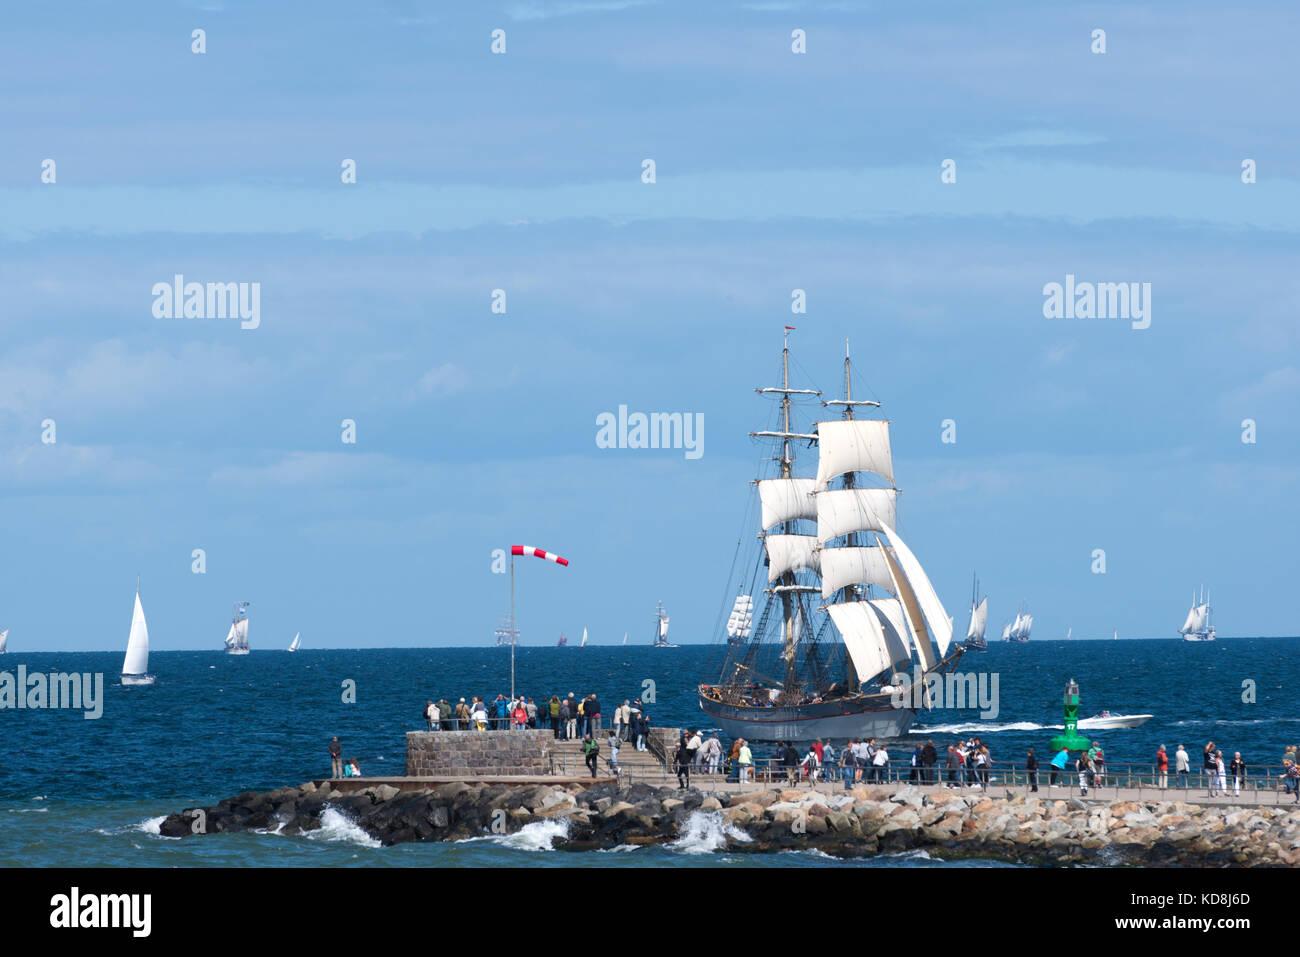 Hanse Sail 2017, Warnemünde, Rostock, Mecklenburg-Western Pomerania, Germany - Stock Image